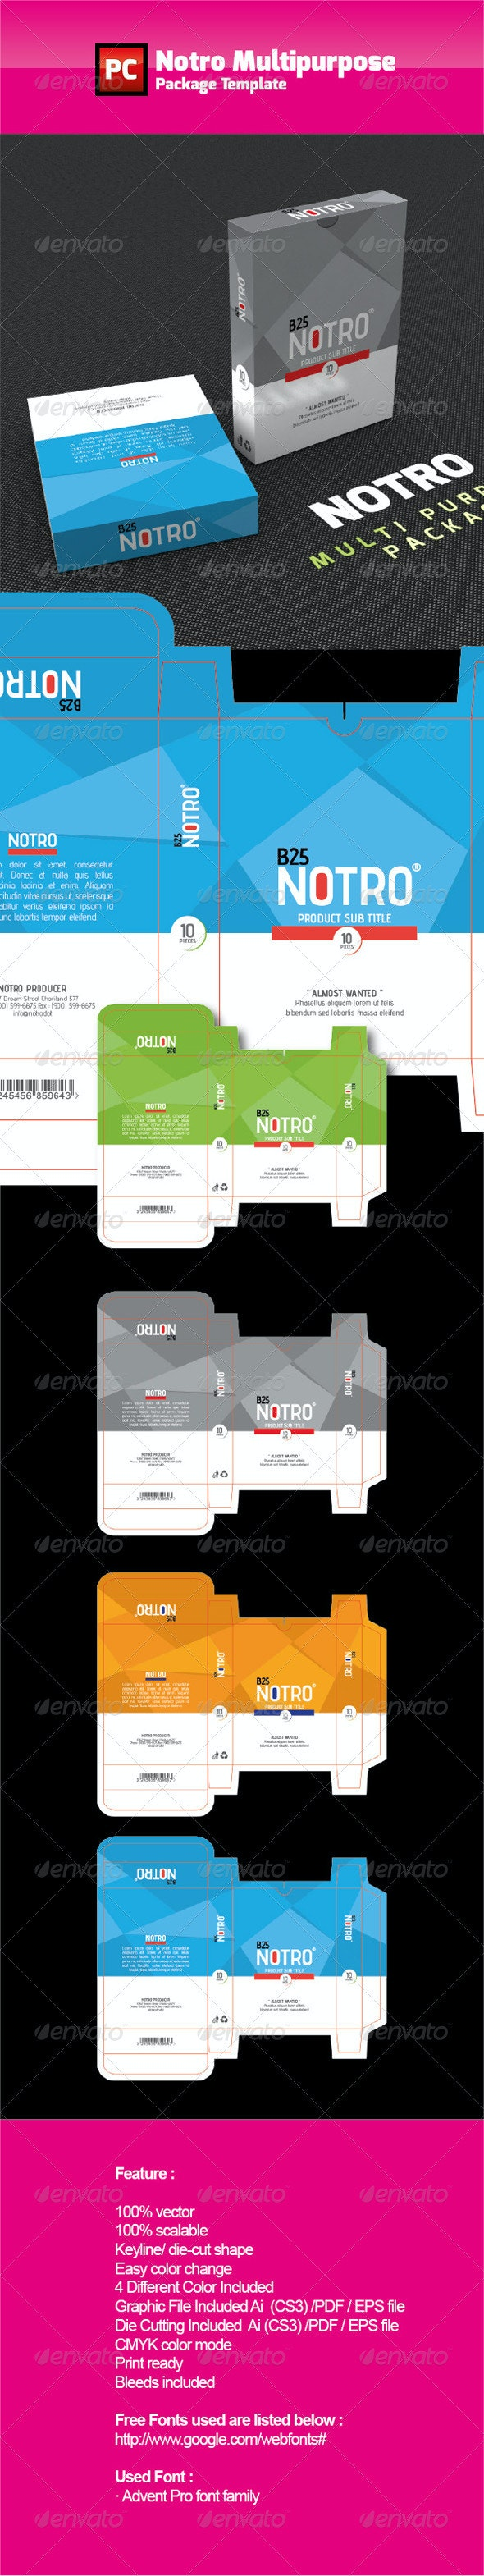 NOTRO Multipurpose Box Template - Packaging Print Templates